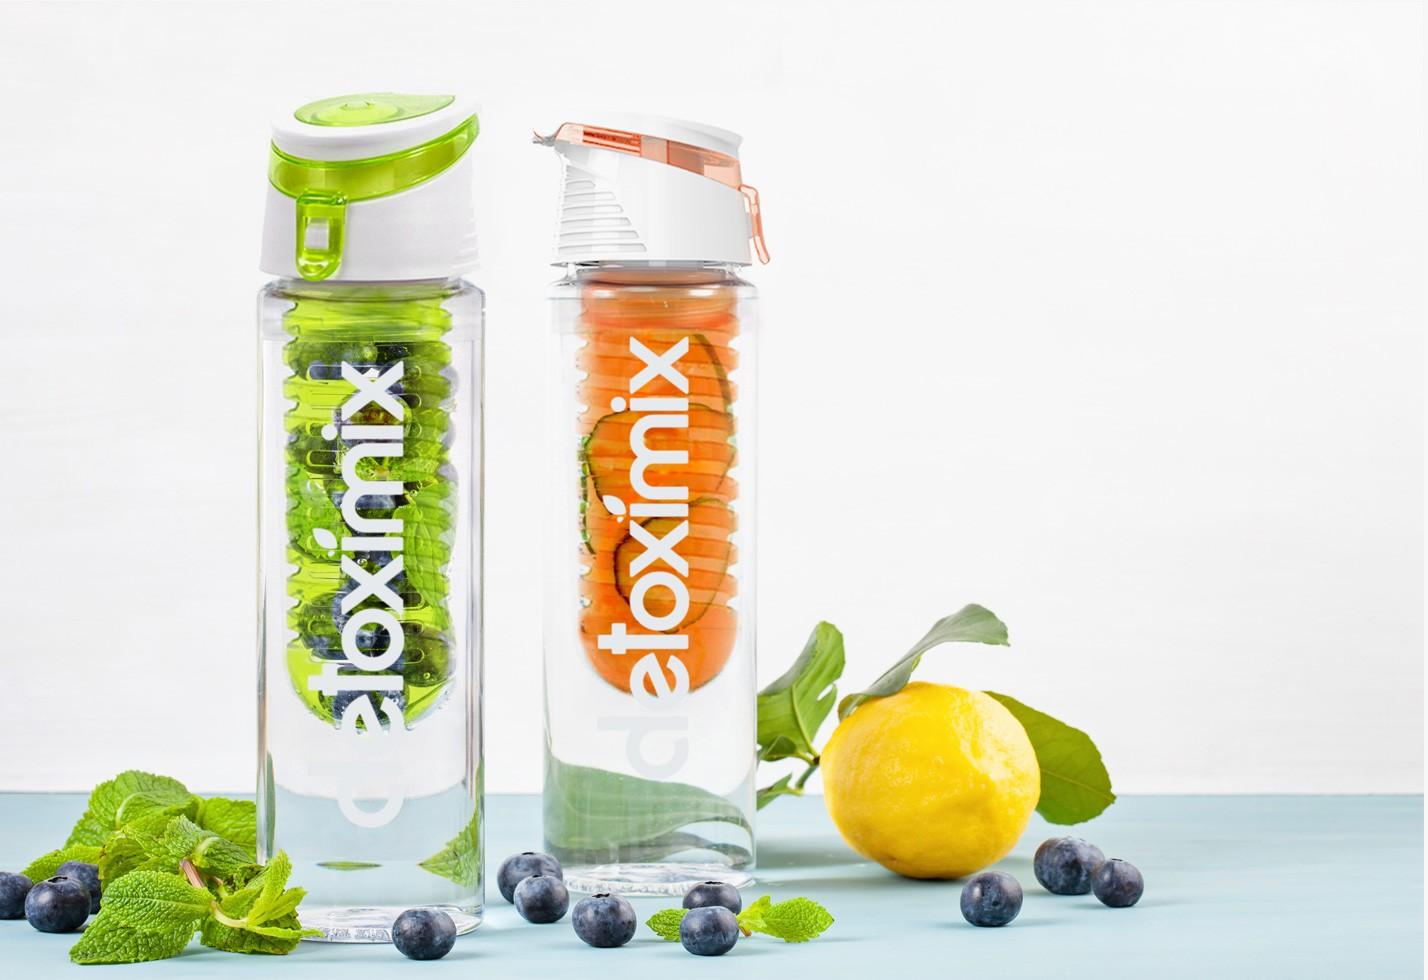 detoximix fruit infuser